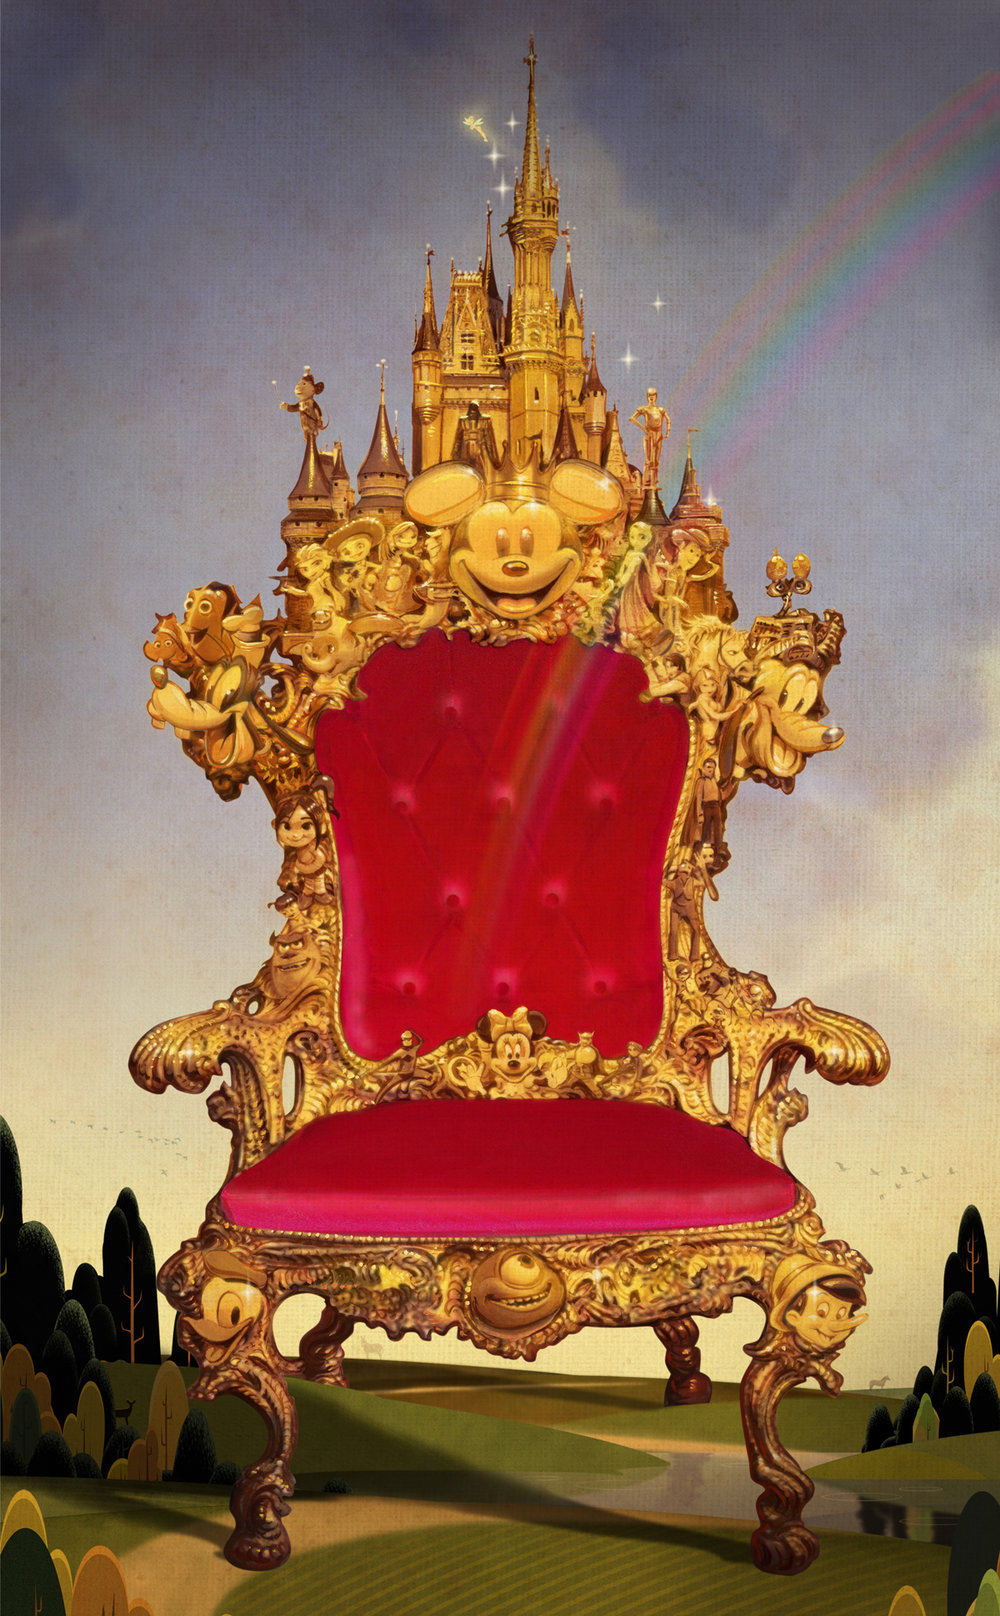 The Disney Throne